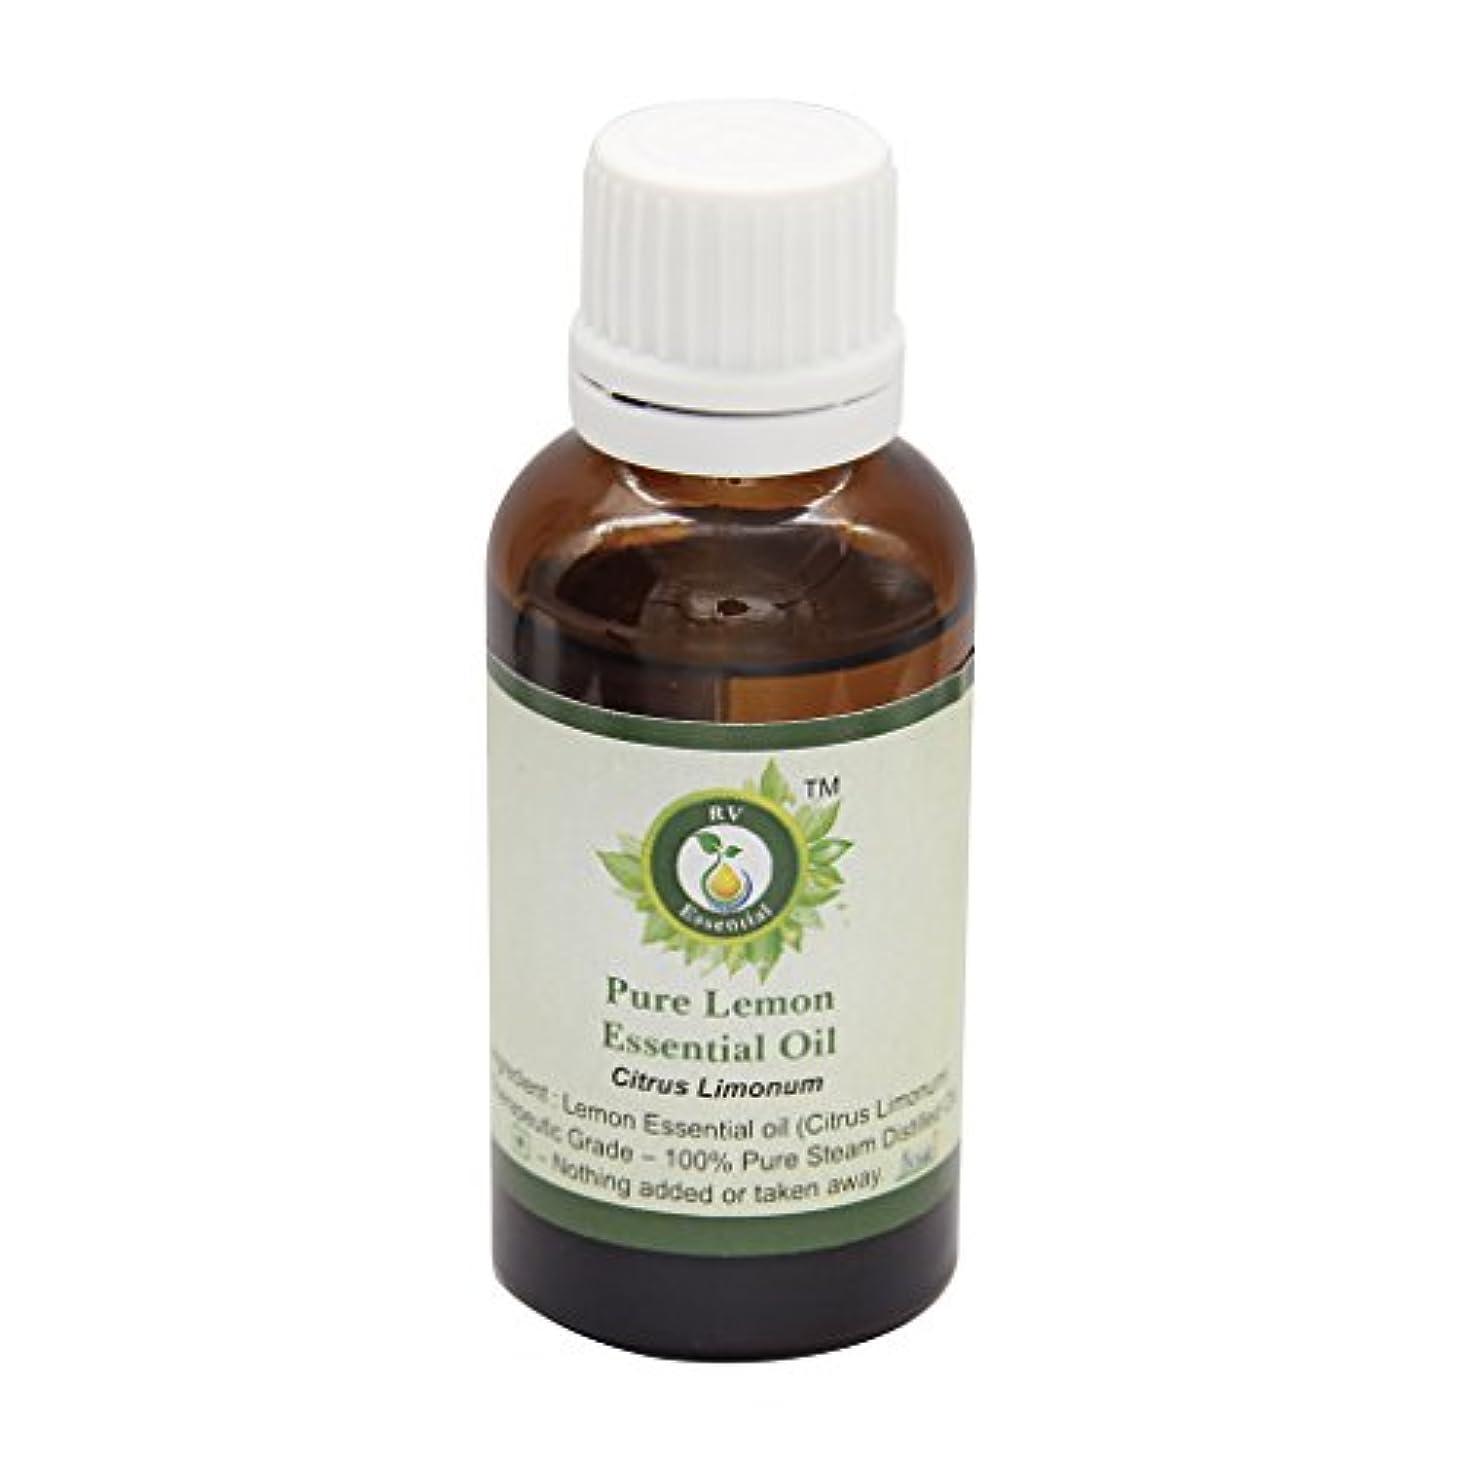 R V Essential ピュアレモンエッセンシャルオイル15ml (0.507oz)- Citrus Limonum (100%純粋&天然スチームDistilled) Pure Lemon Essential Oil